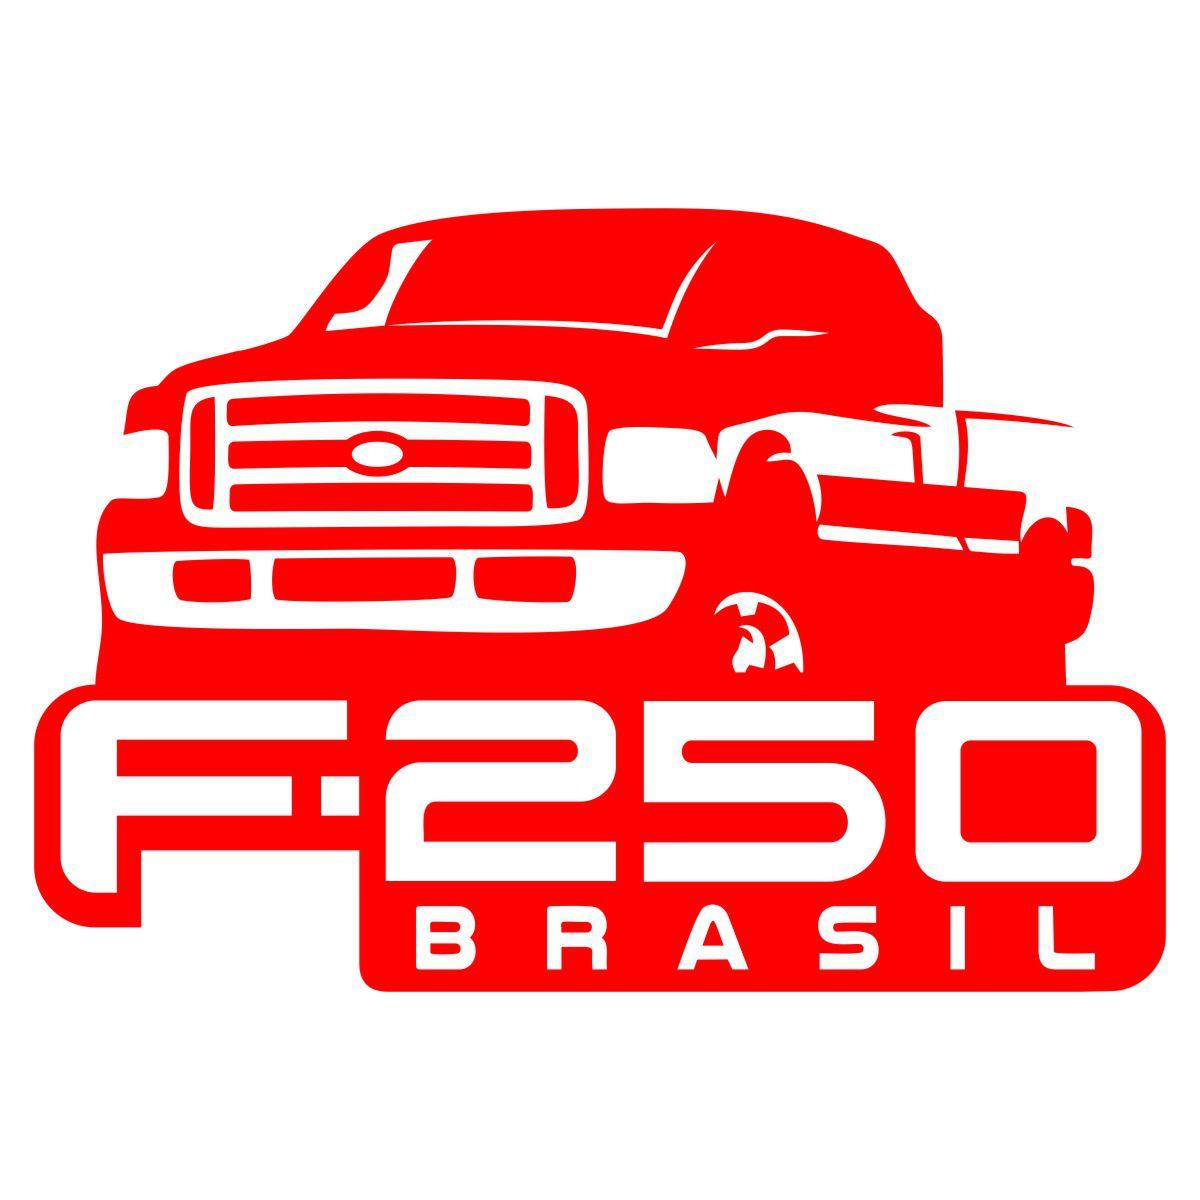 Adesivo Ford F-250 Brasil - Várias Cores